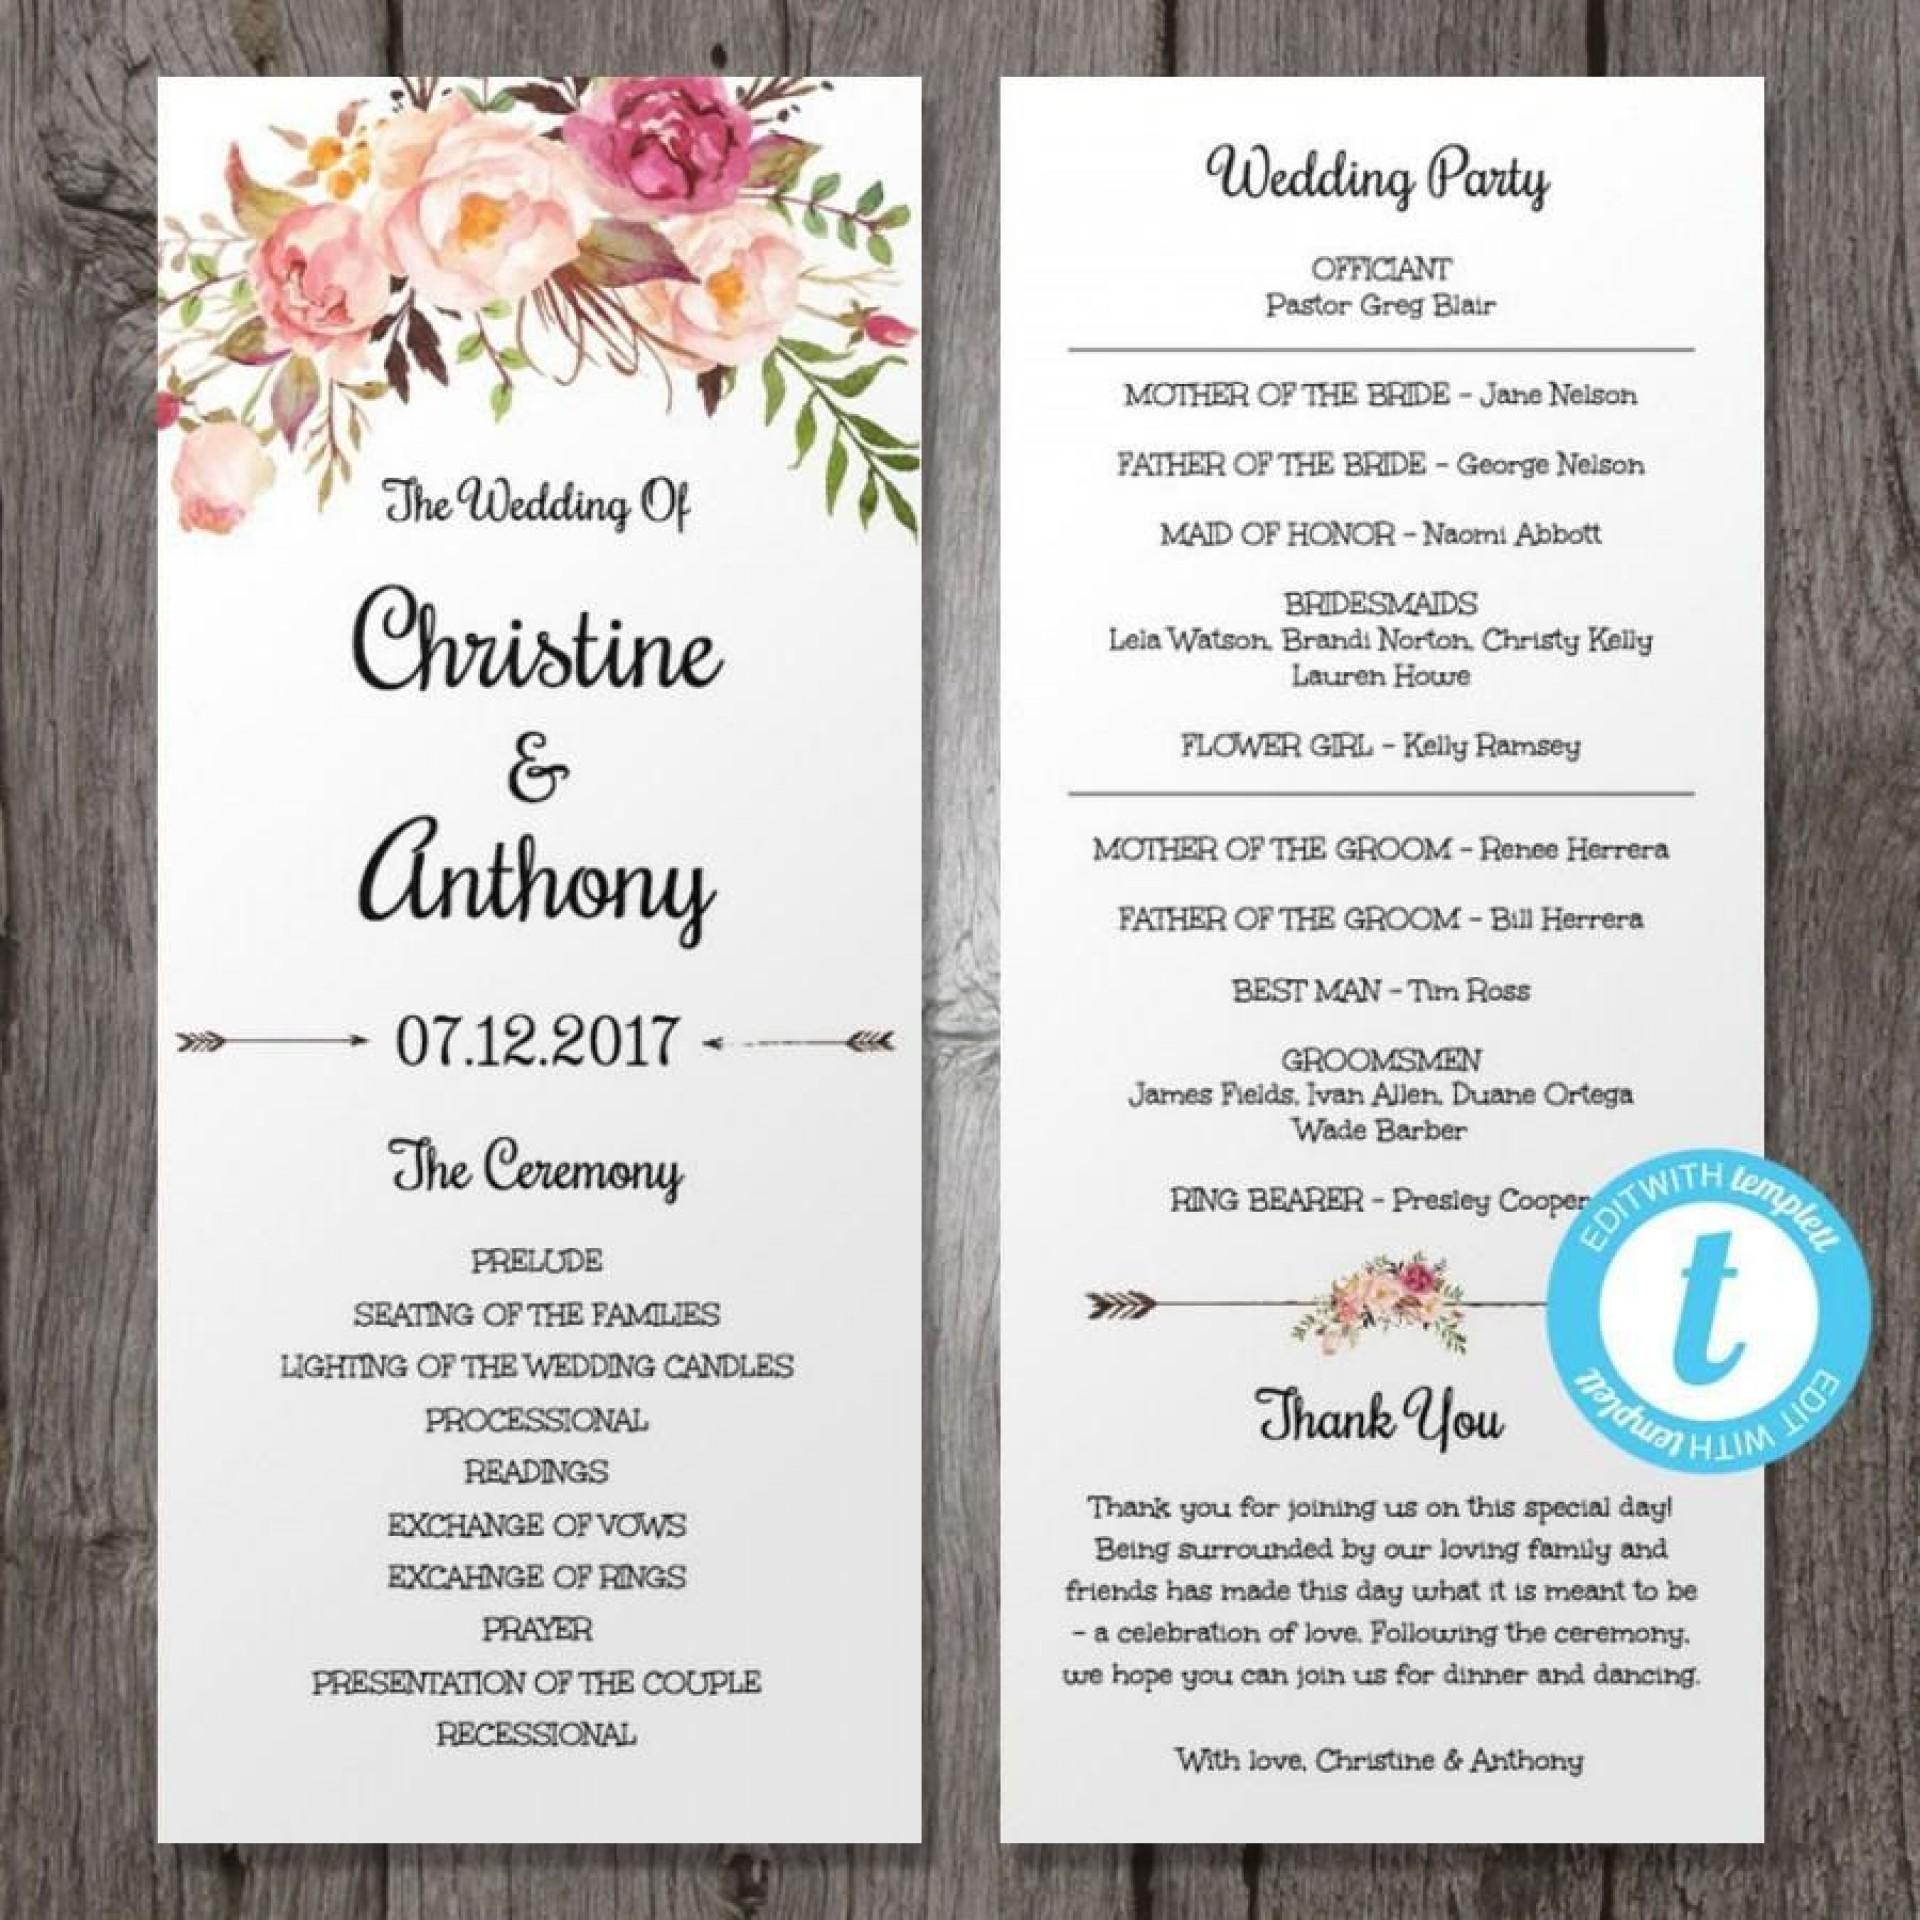 004 Impressive Free Printable Wedding Program Template Photo  Templates Microsoft Word Indian1920